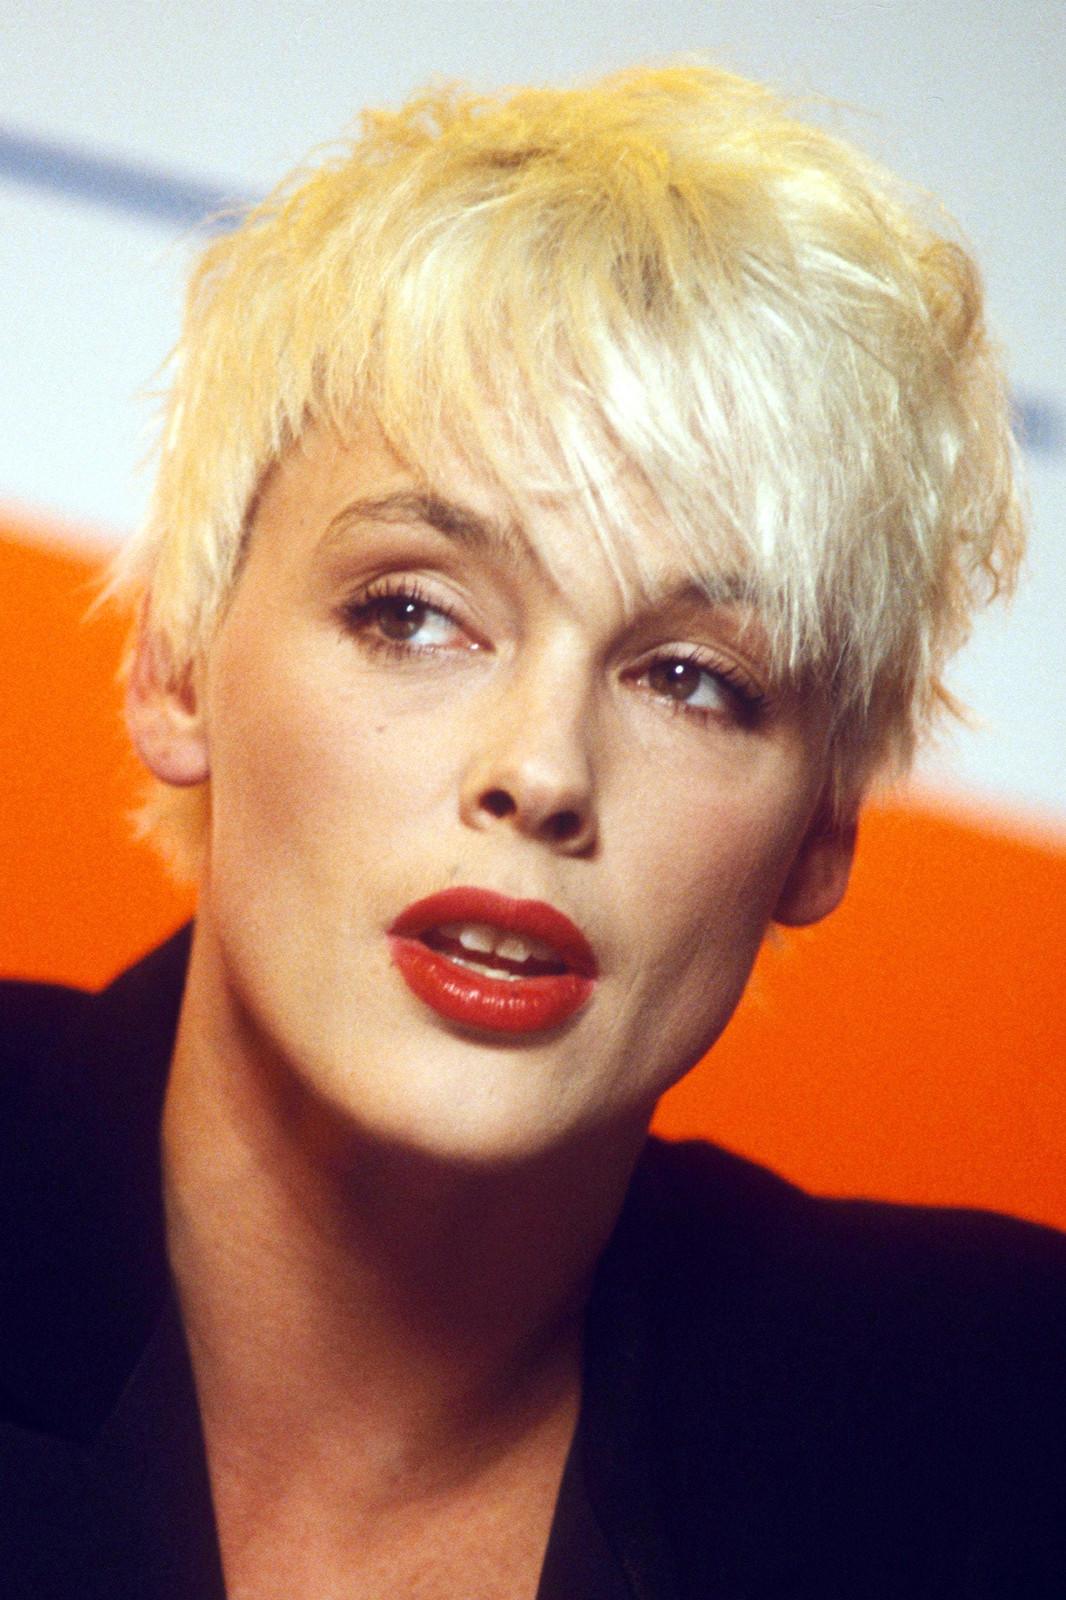 Pixie frisur 04 Brigitte Nielsen 01.jpg